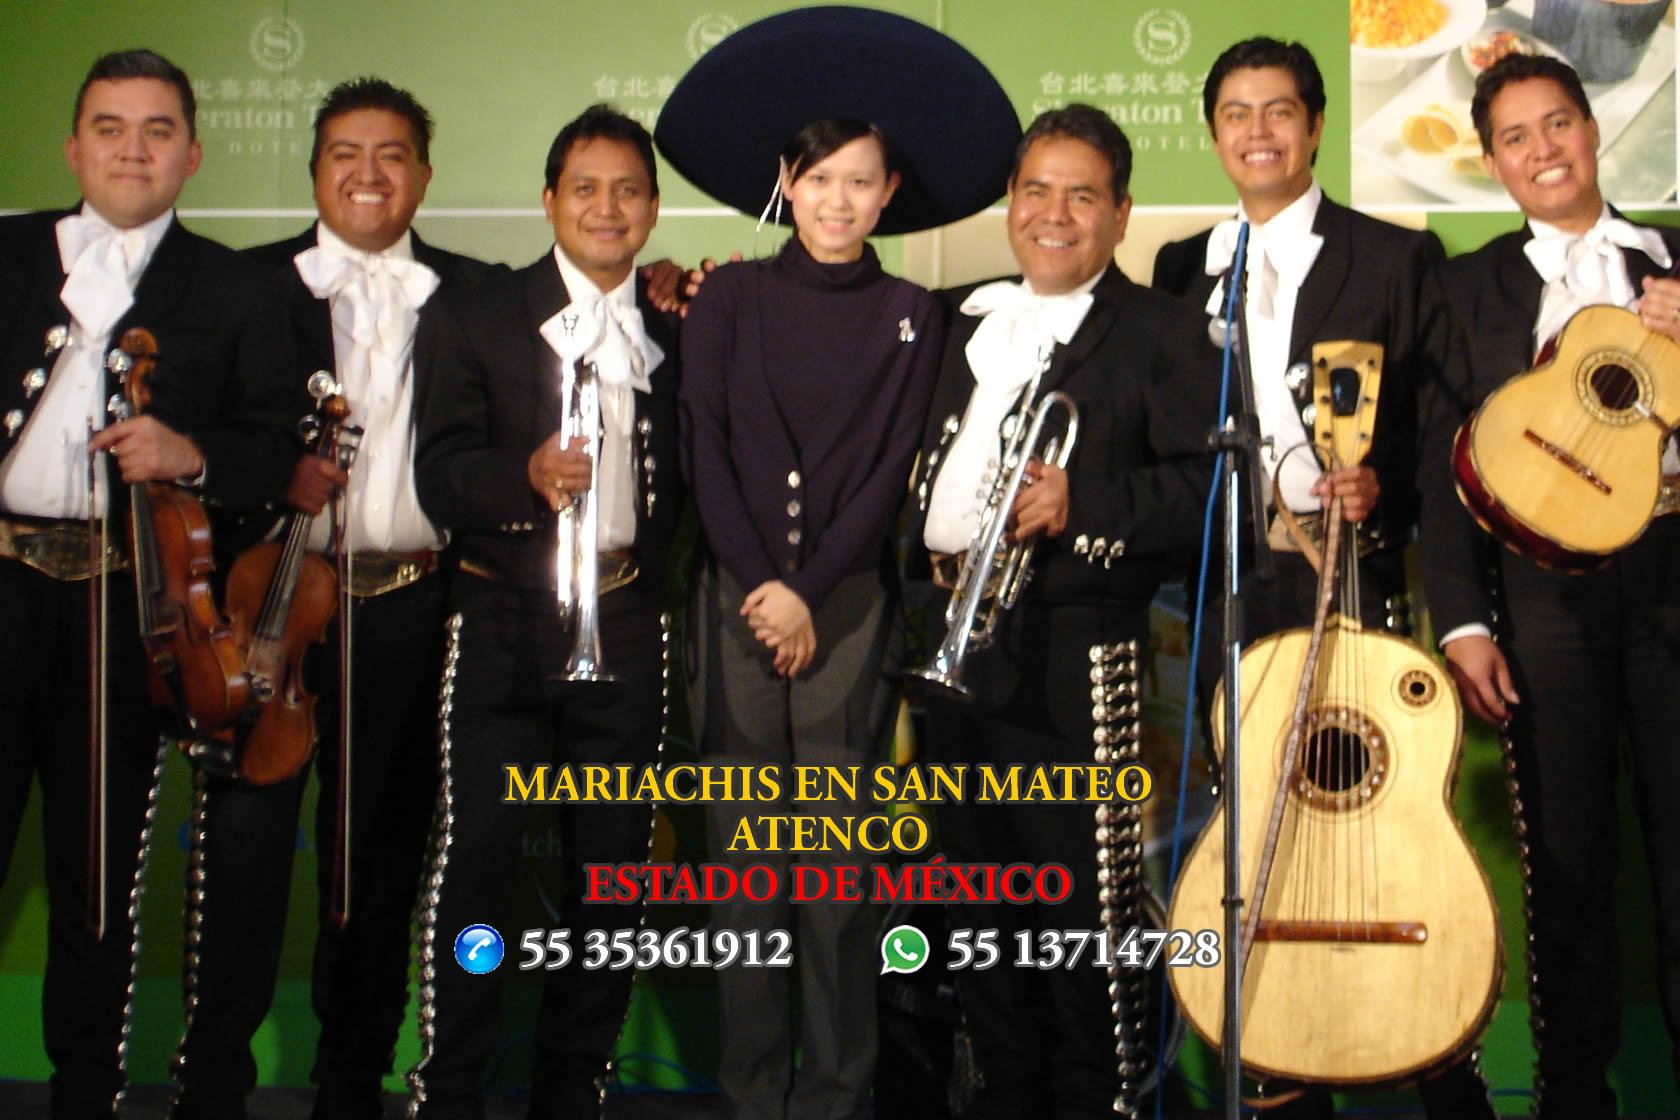 Mariachis en San Mateo Atenco